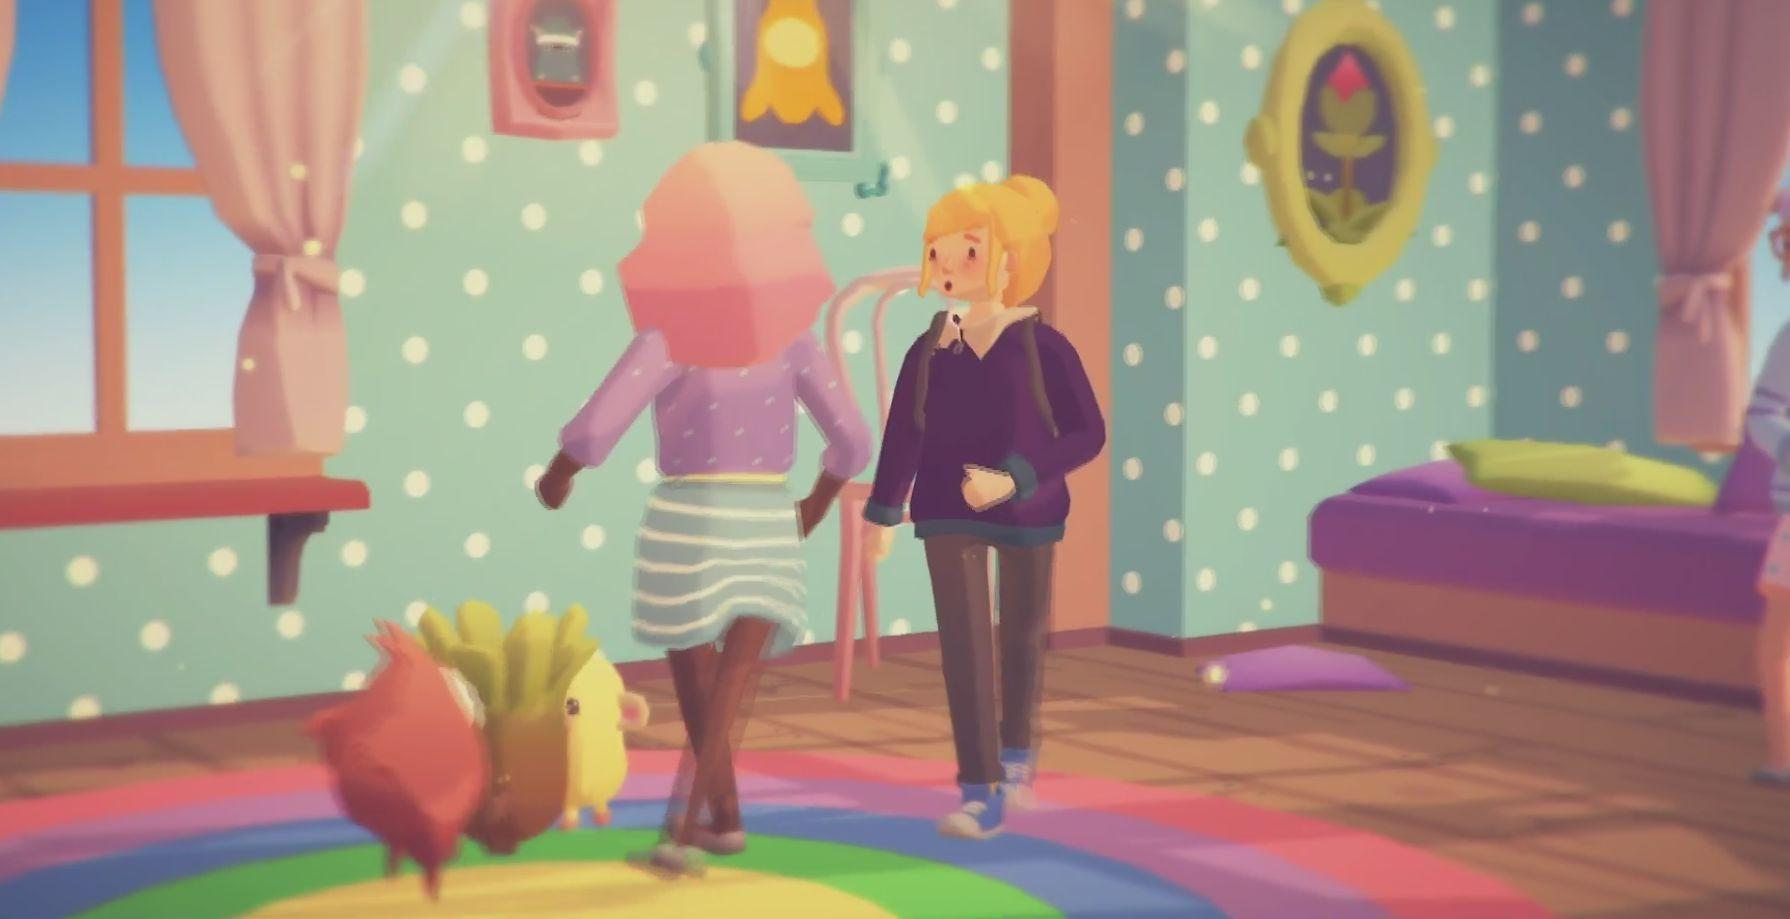 Ooblets' cute style reminds me of Katamari Damacy screenshot